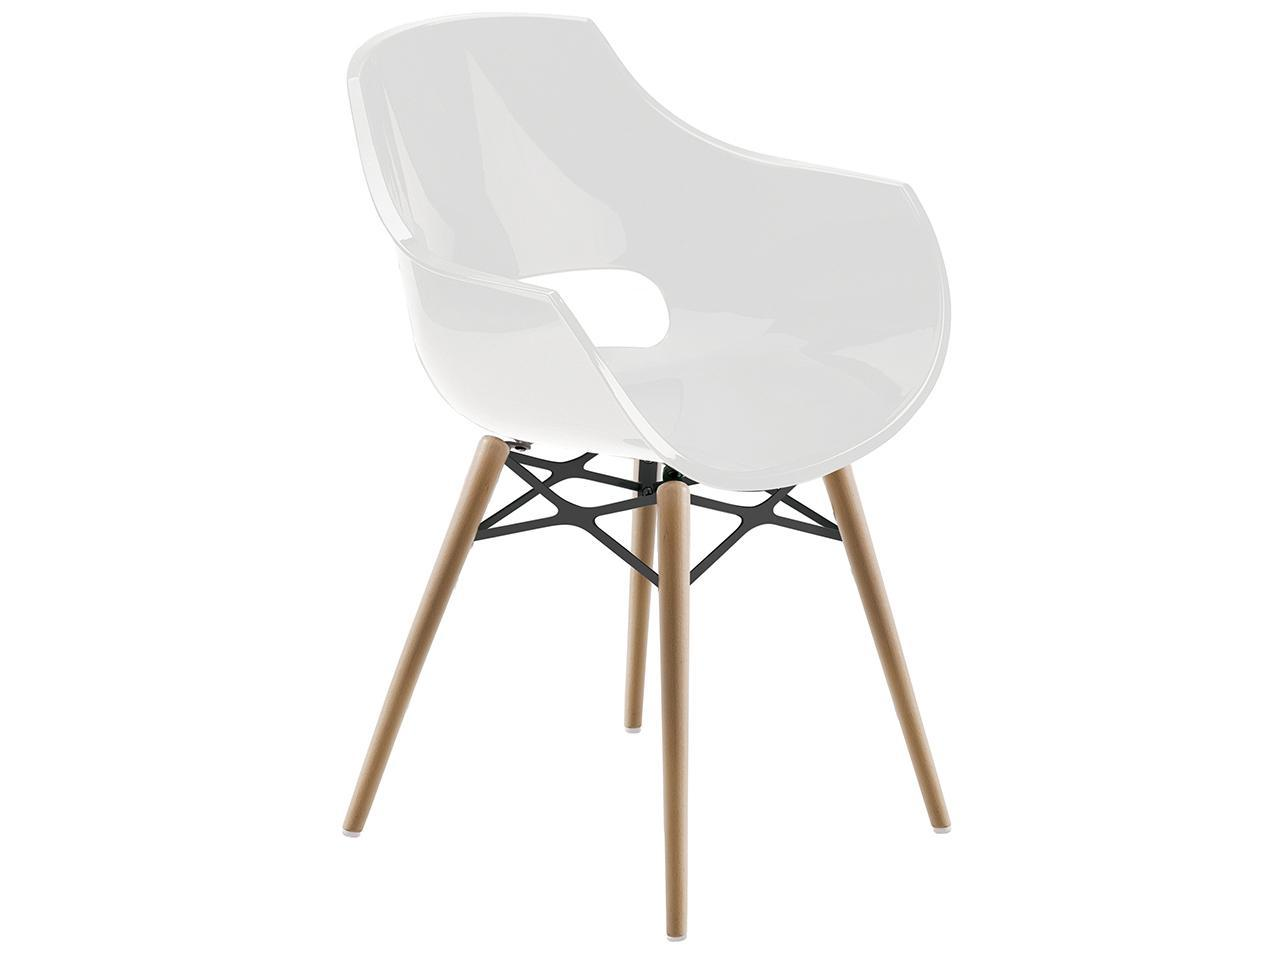 Кресло пластиковое Opal Wox